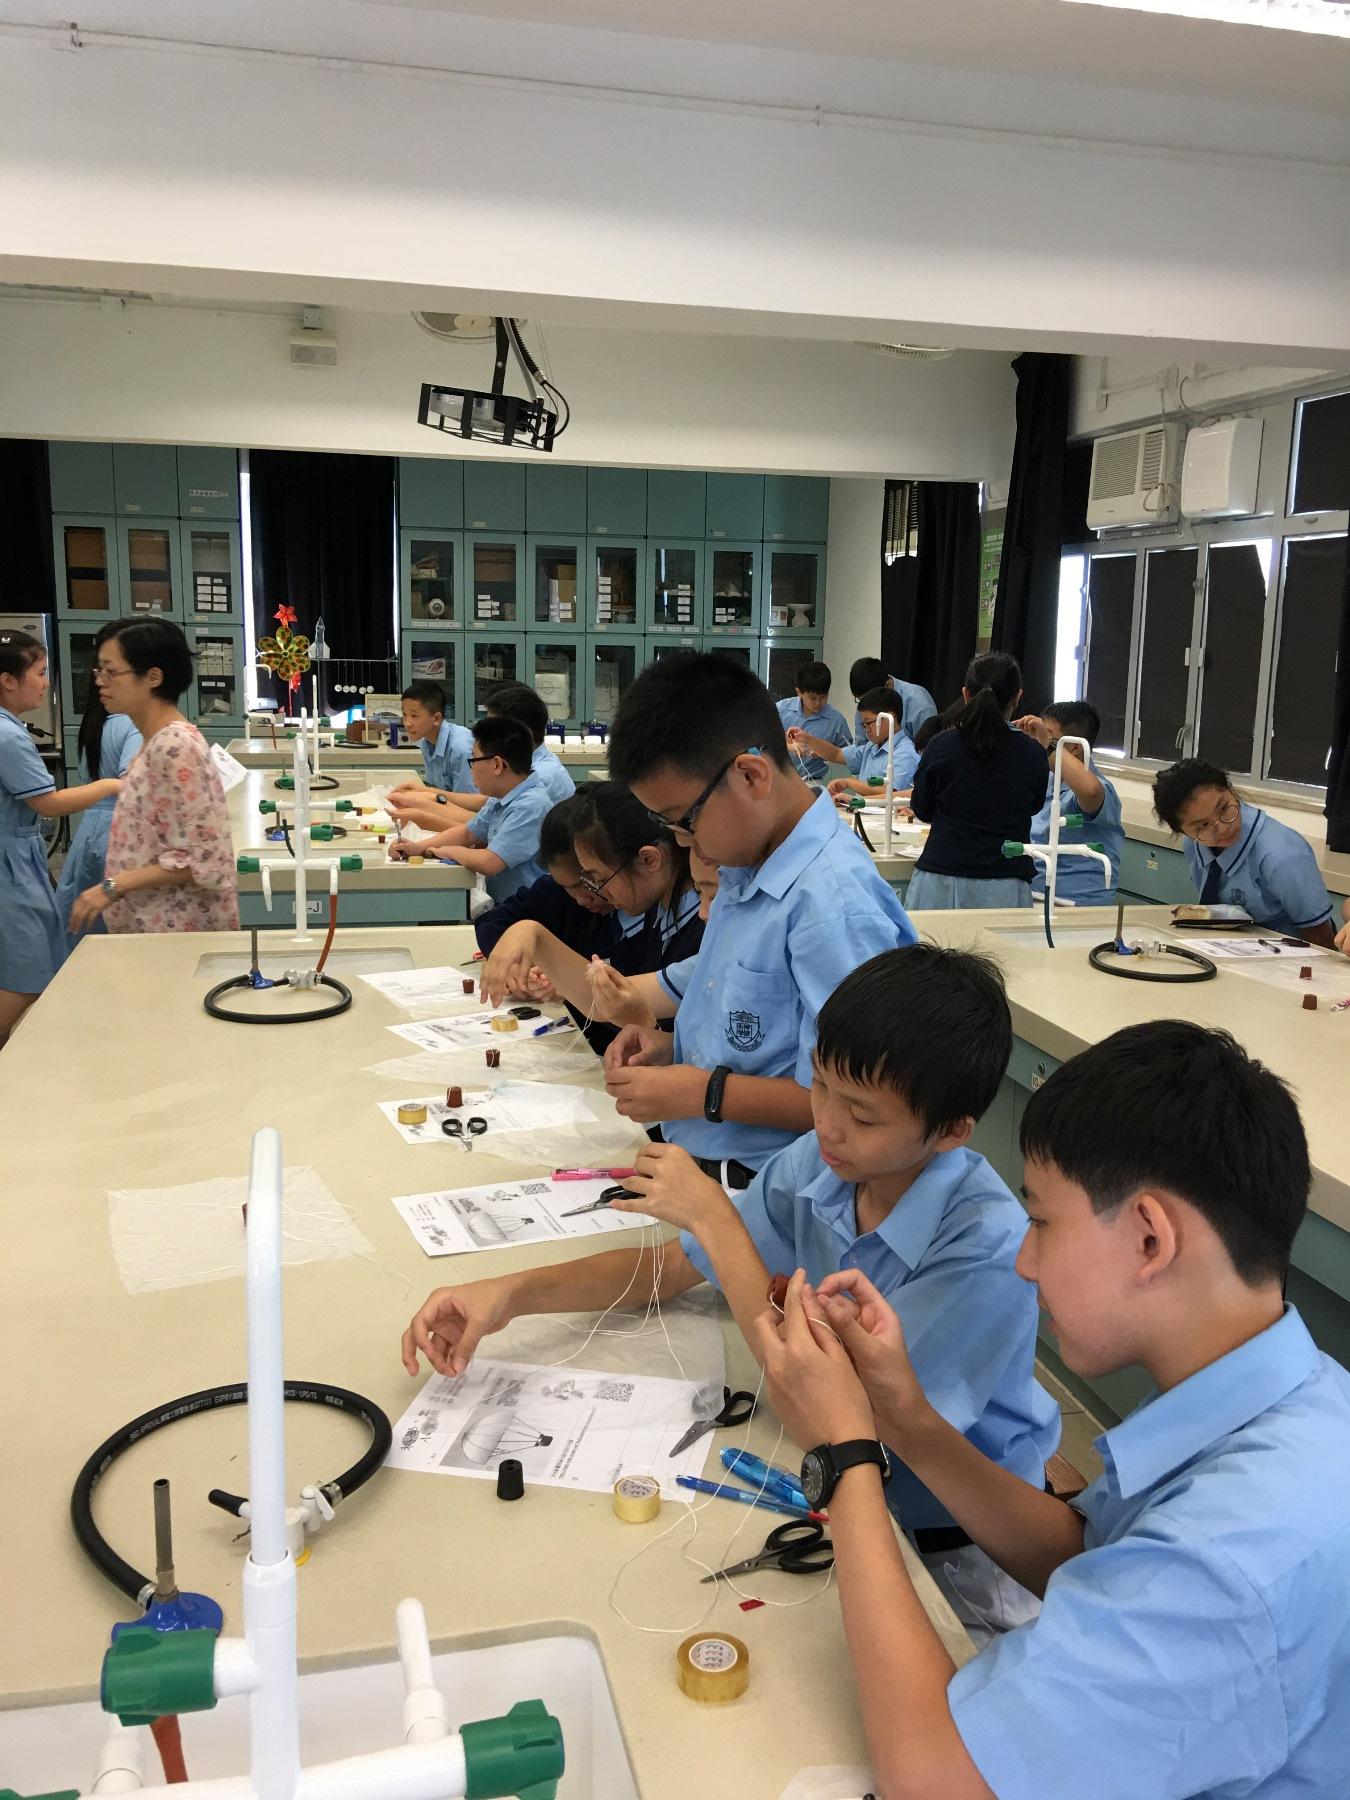 http://www.npc.edu.hk/sites/default/files/img_5677.jpg